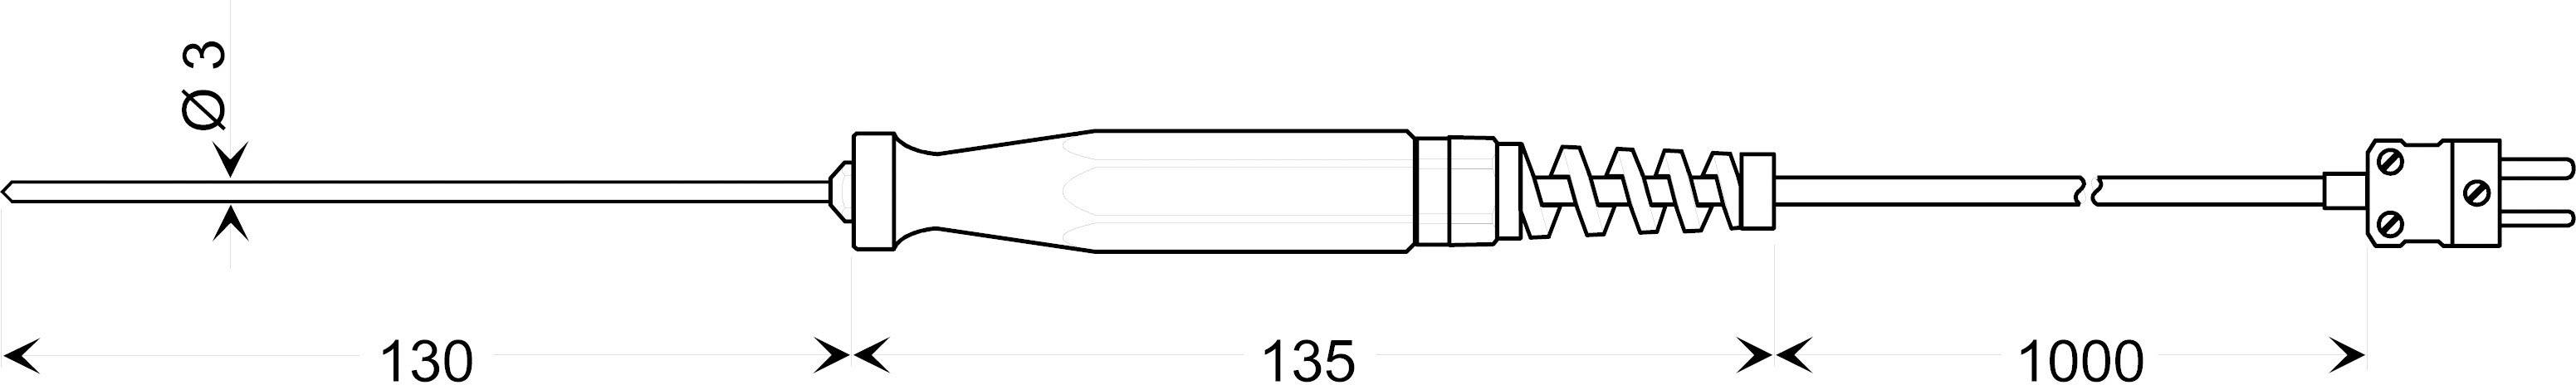 Teplotné čidlo Greisinger GES 900, typ K, -65 až +1000 °C